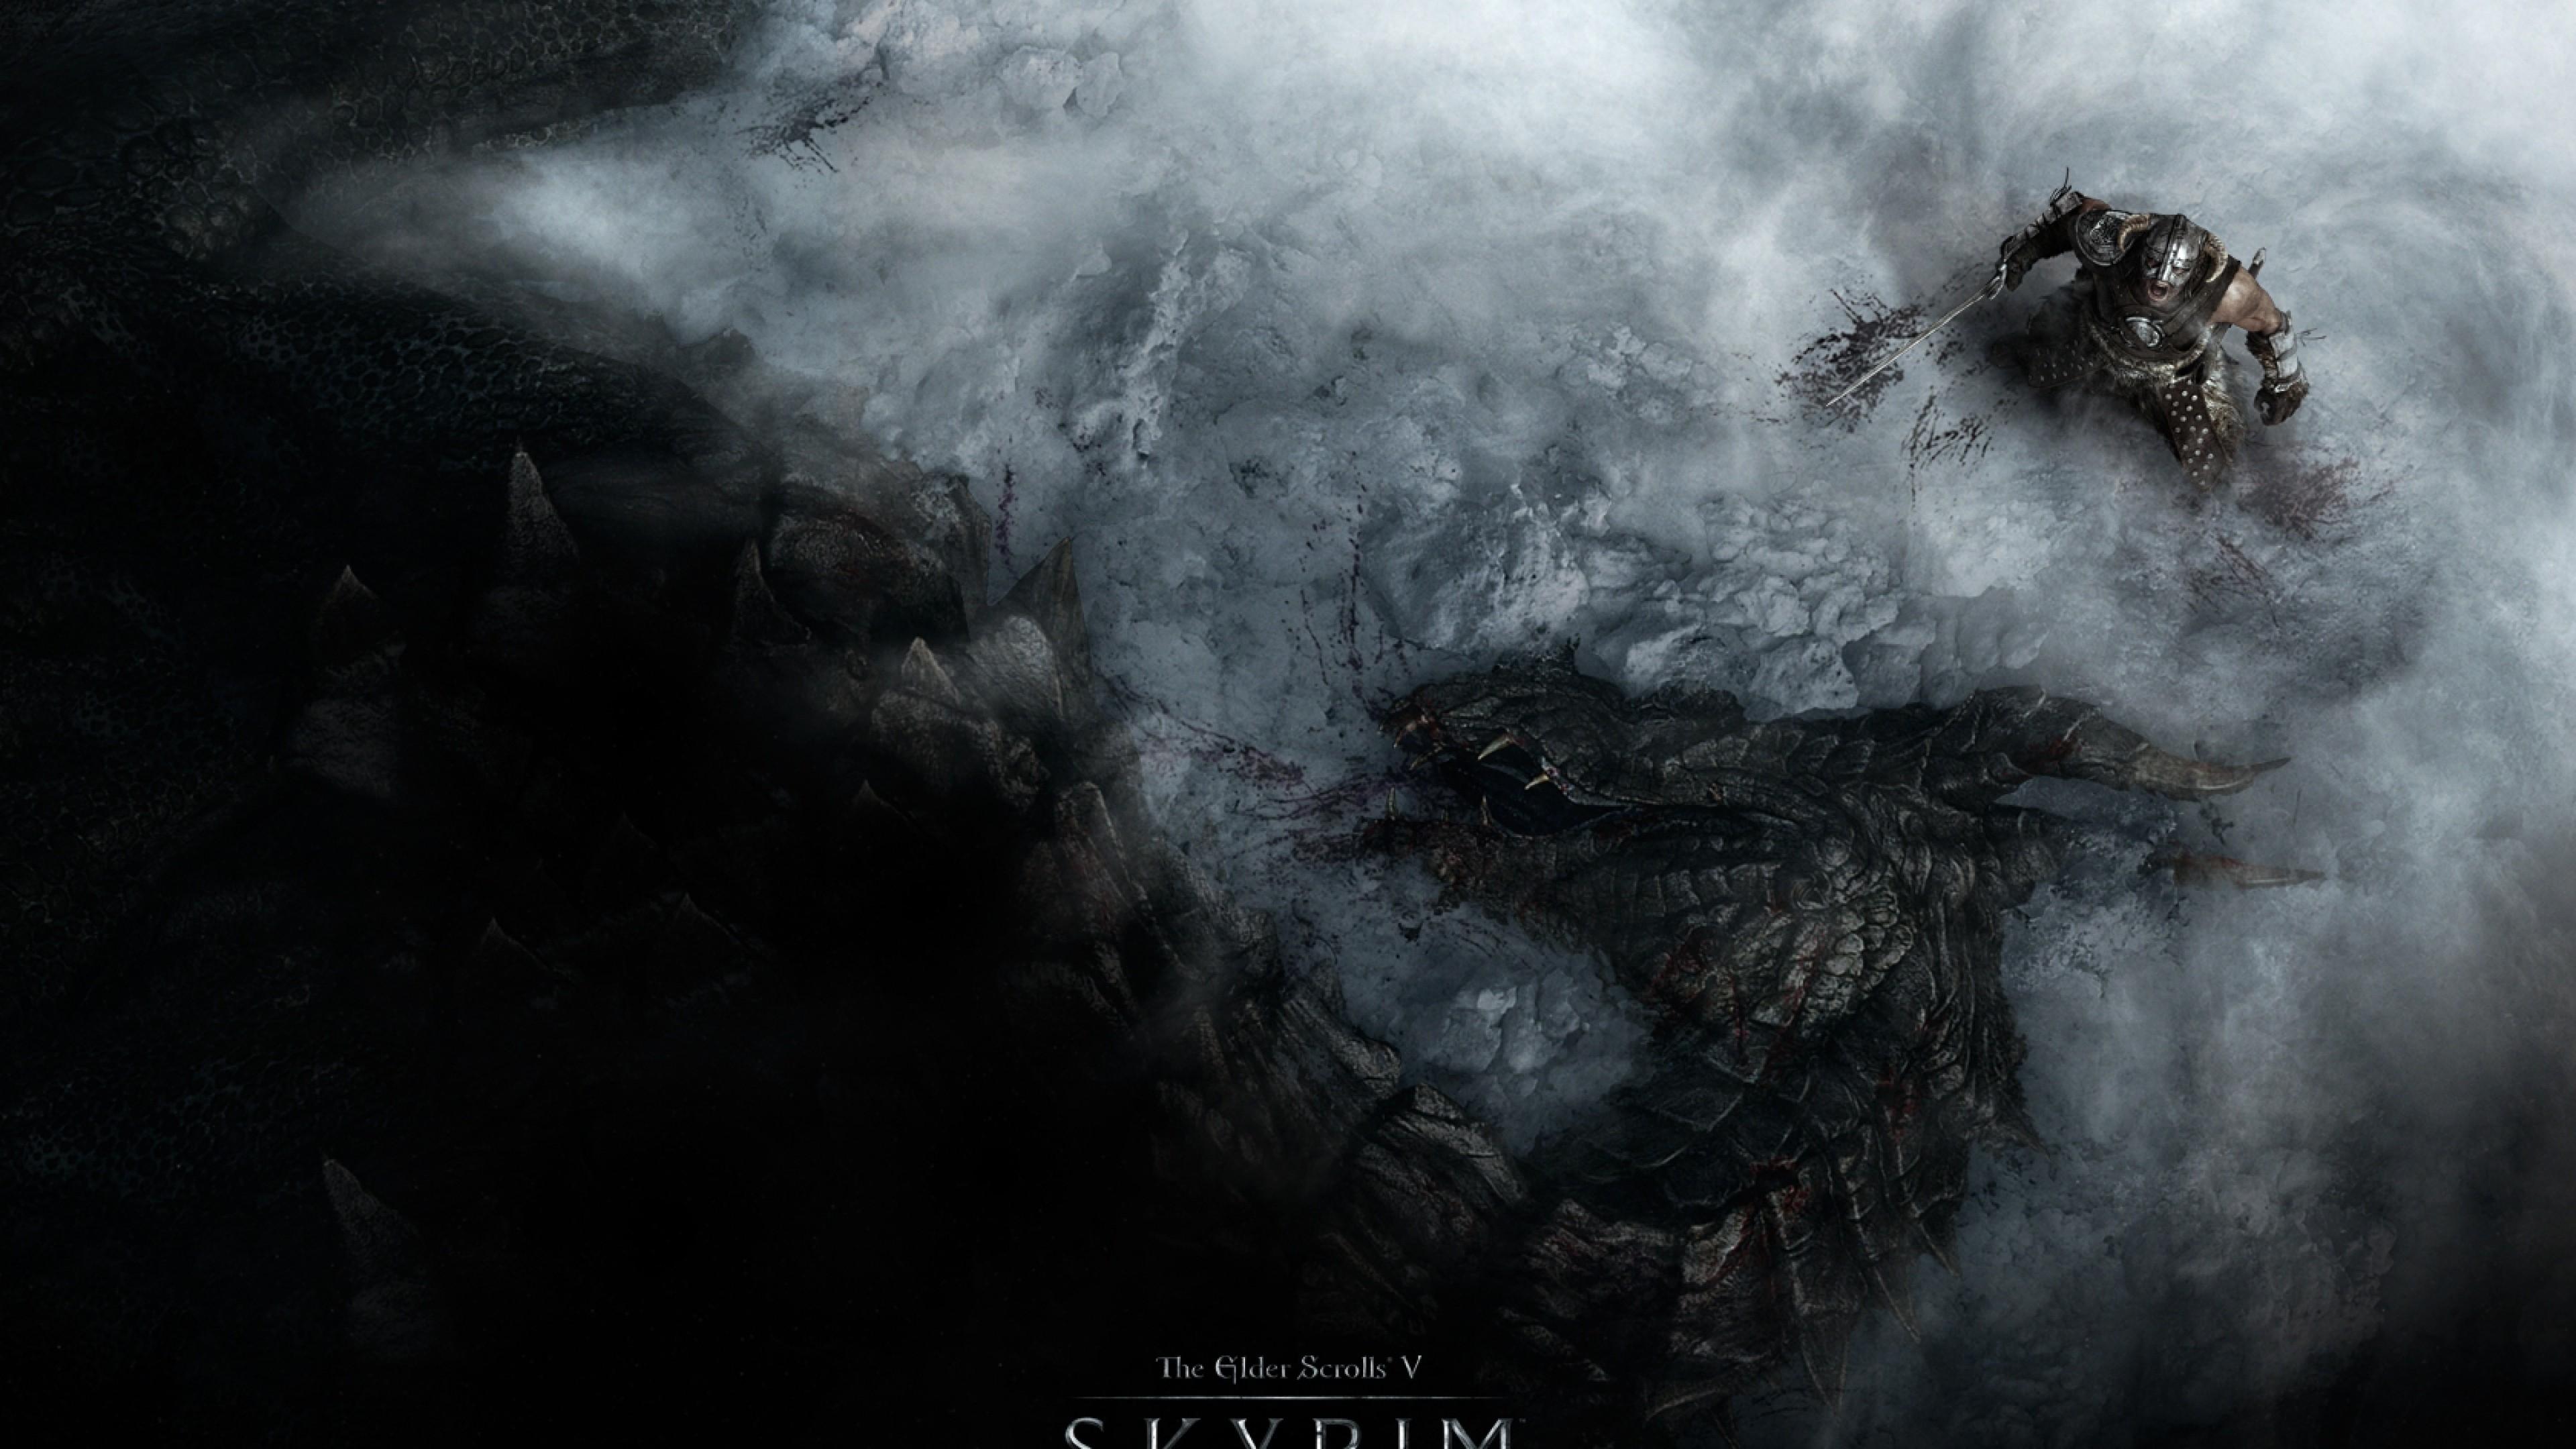 Download Wallpaper The elder scrolls skyrim, Warrior, Dragon .